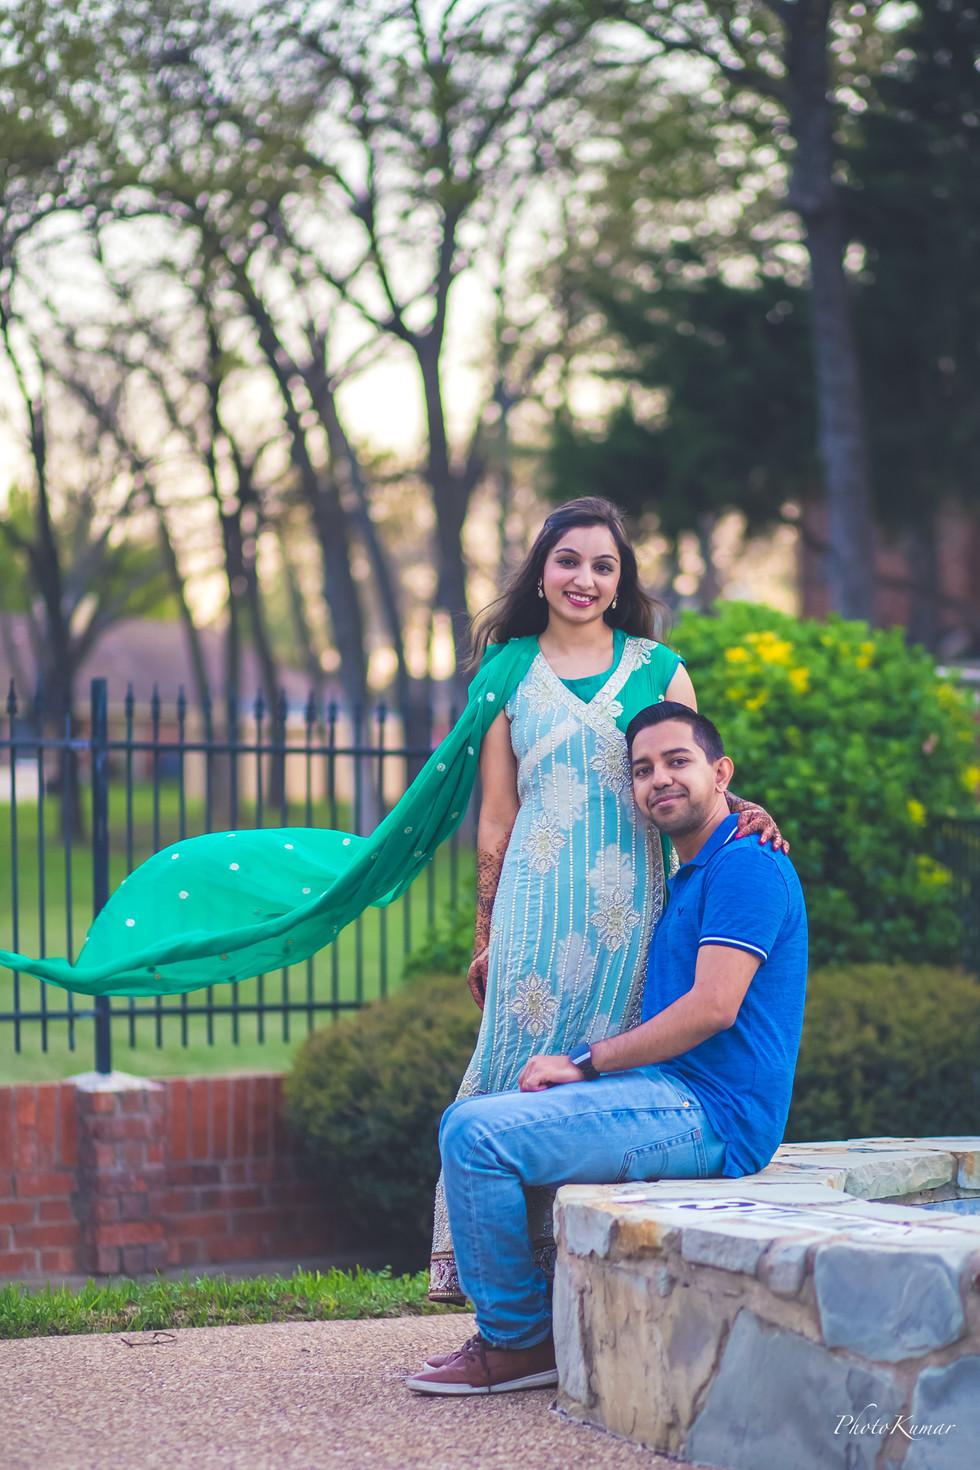 Sonia and Zariyan -PhotoKumar wedding photography -Mahendhi (1 of 1)-6.jpg